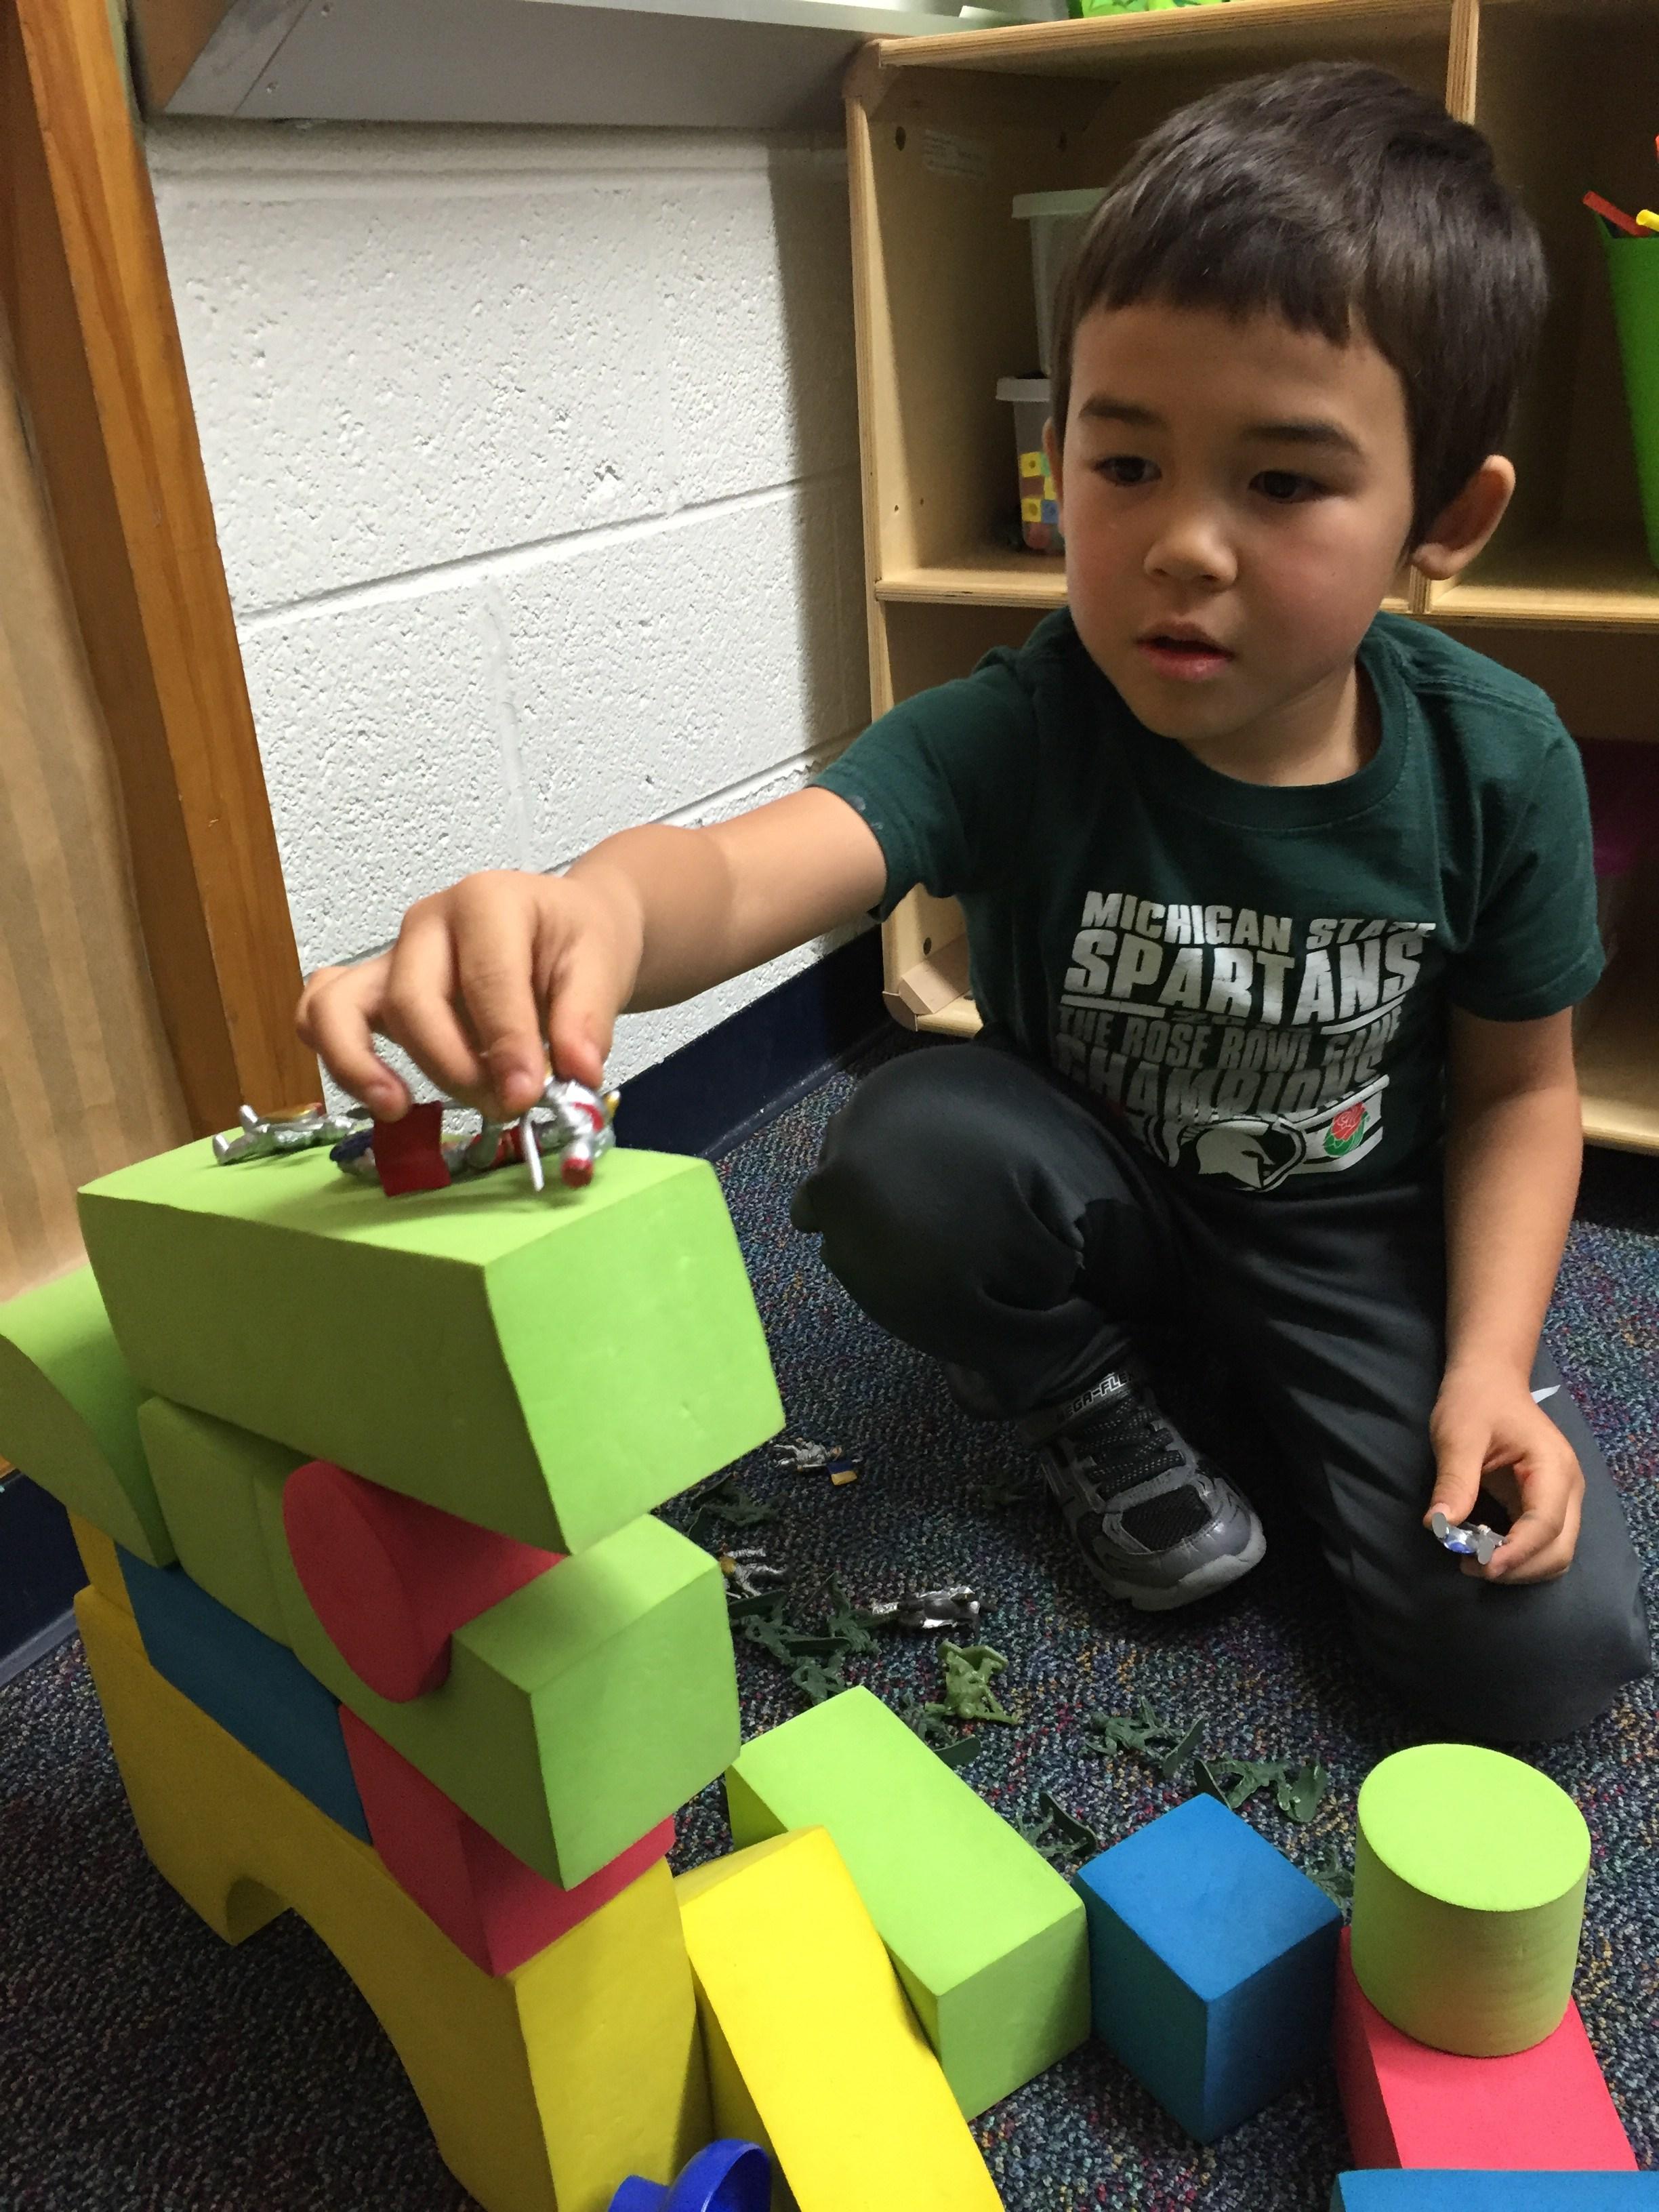 Kids' Club playing with blocks.